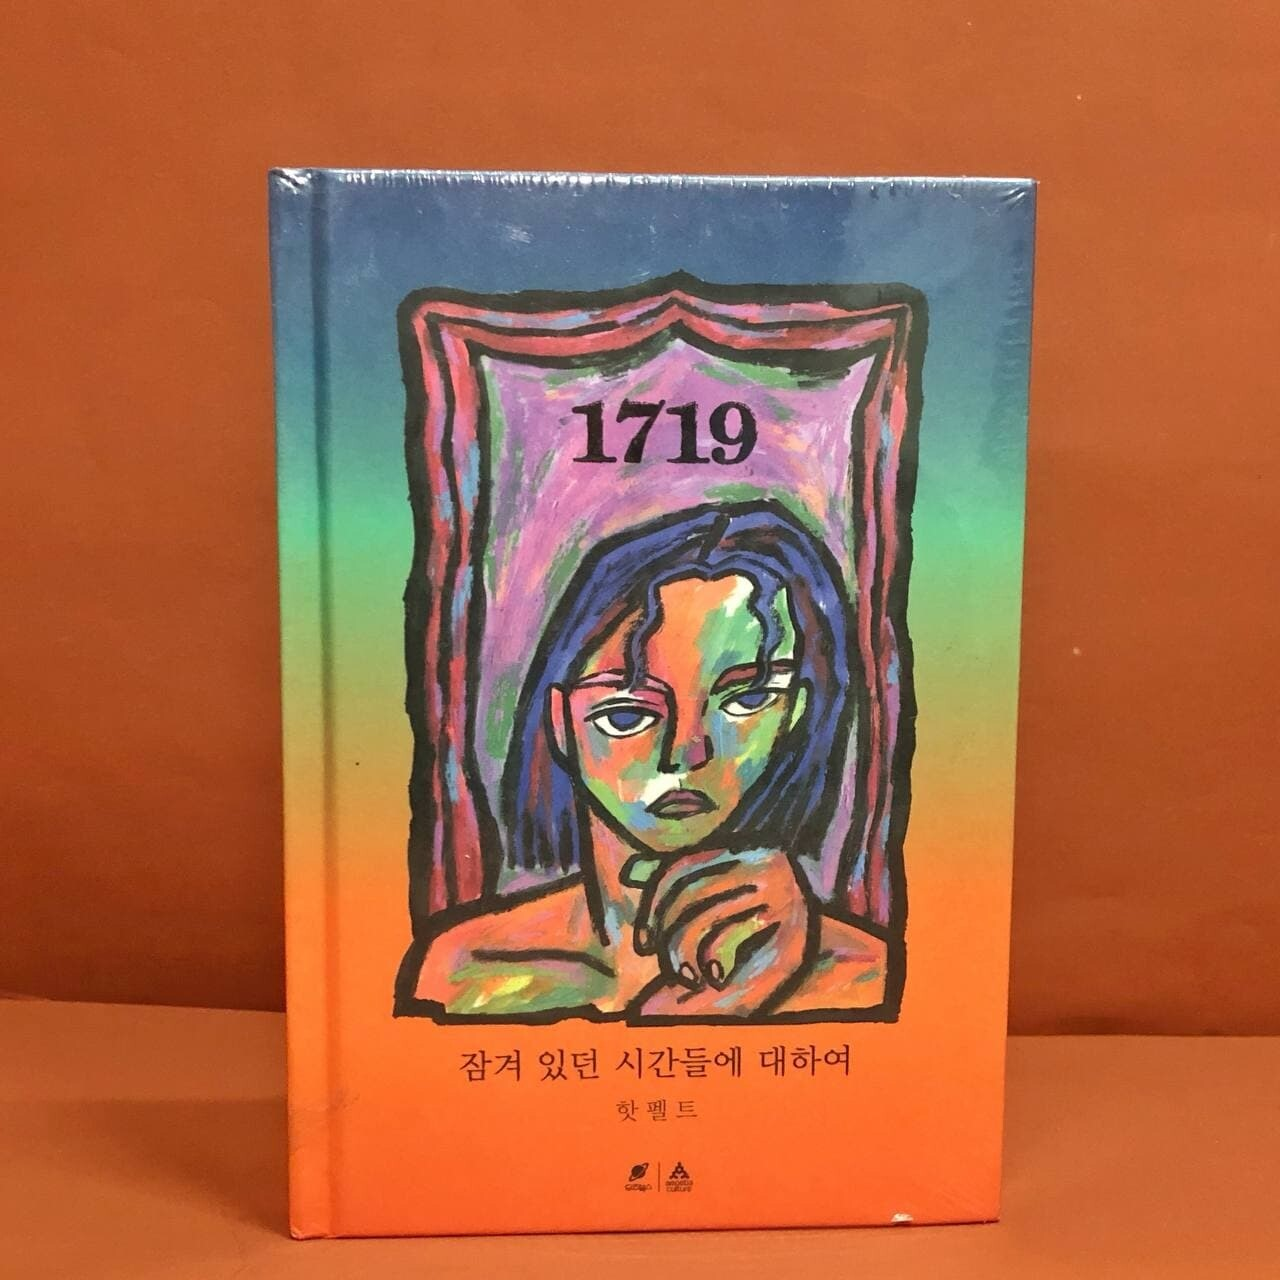 [ONHAND] HA:TFELT - 1719 [Limited Edition] Sealed